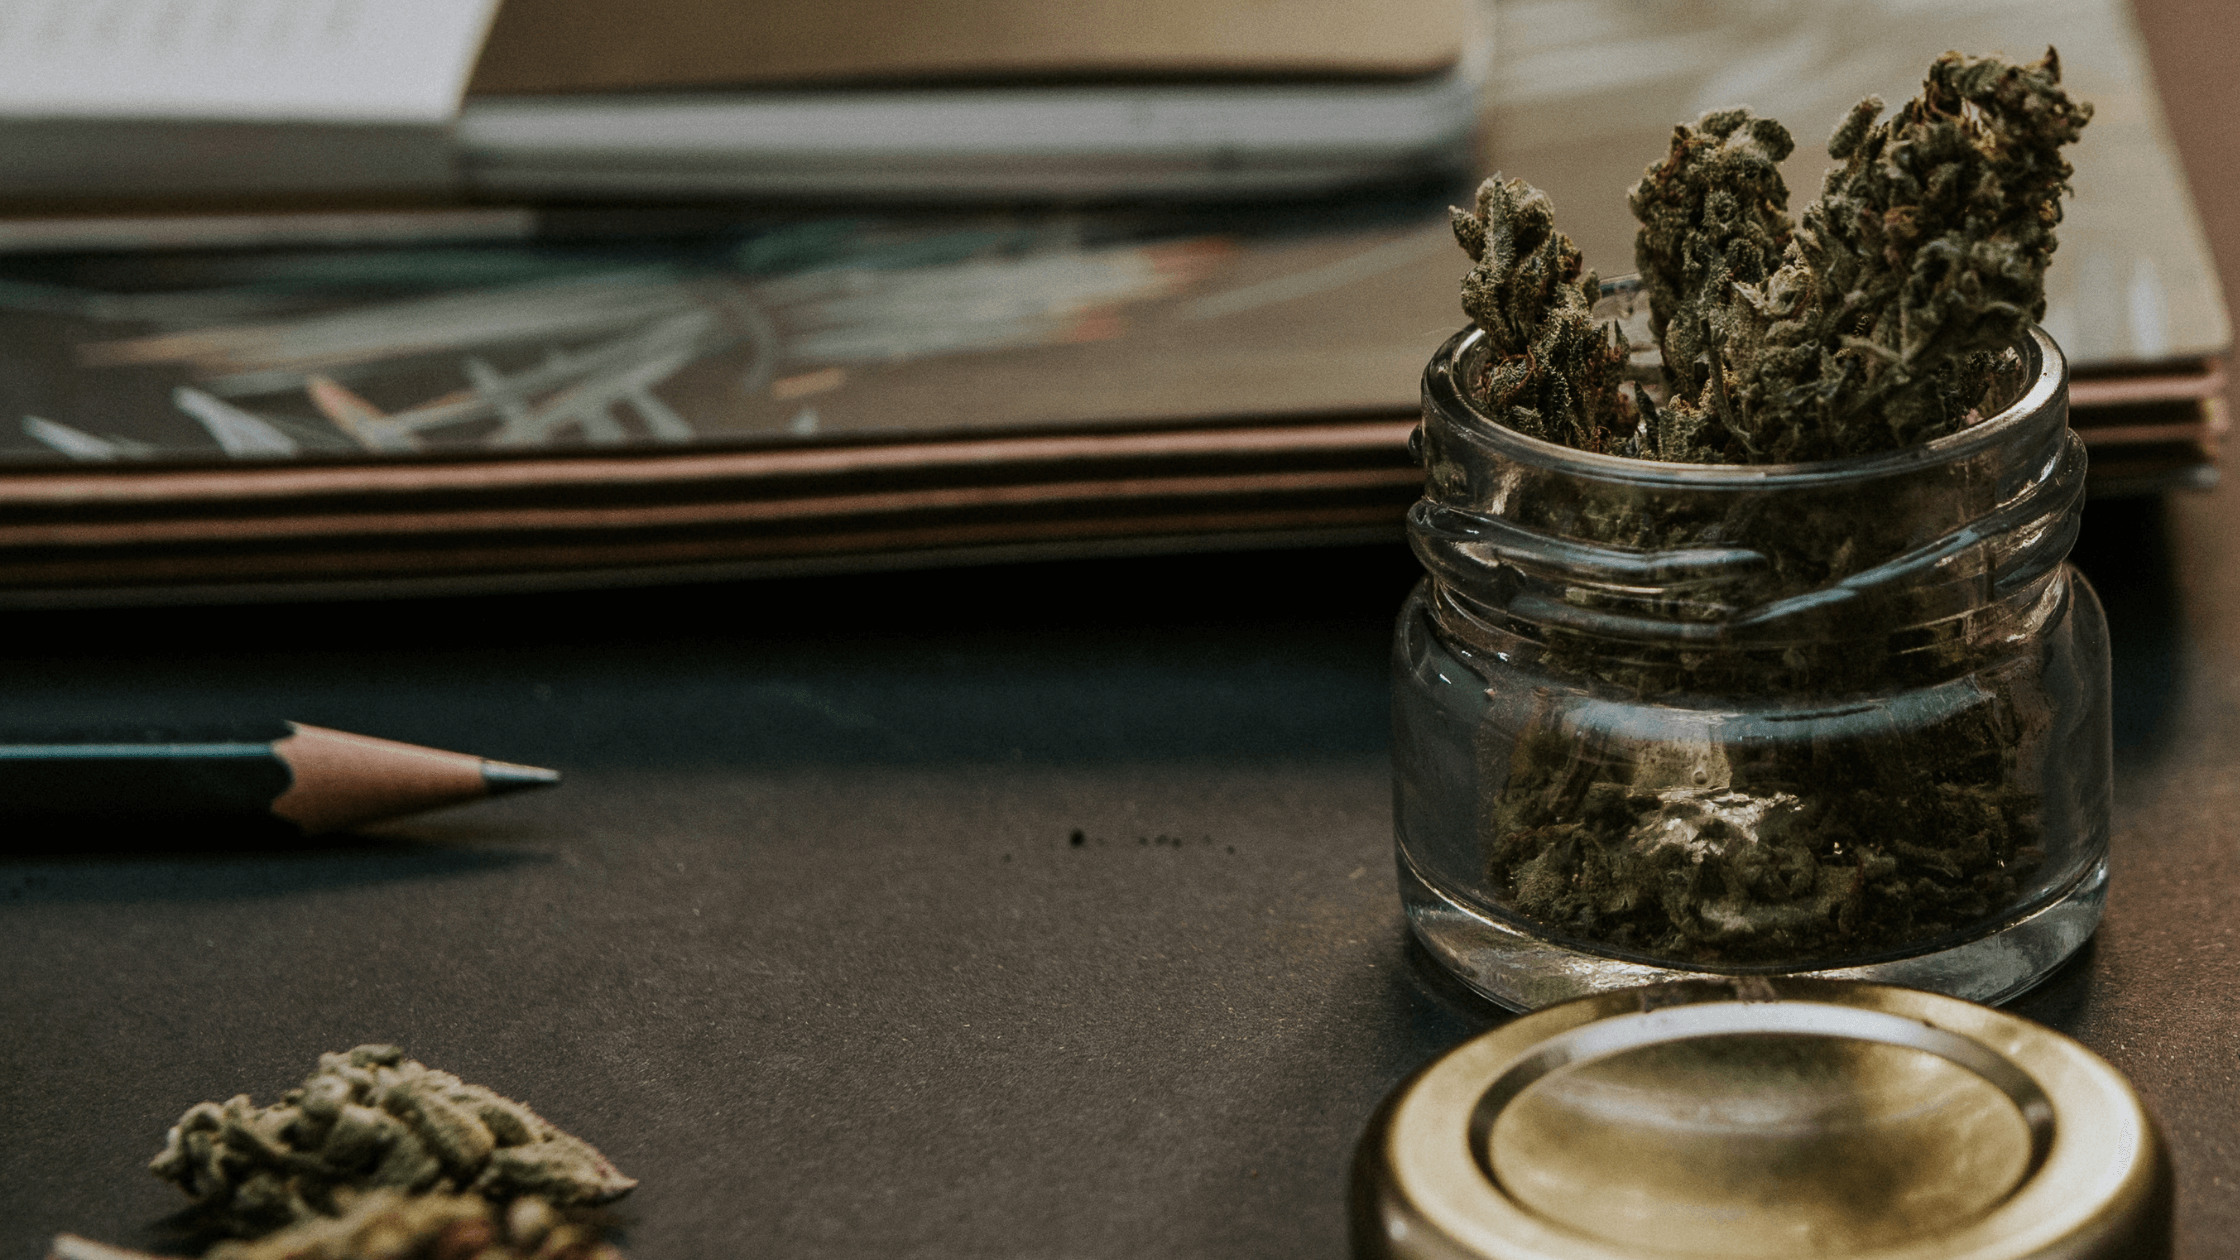 tips for storing medical marijuana properly